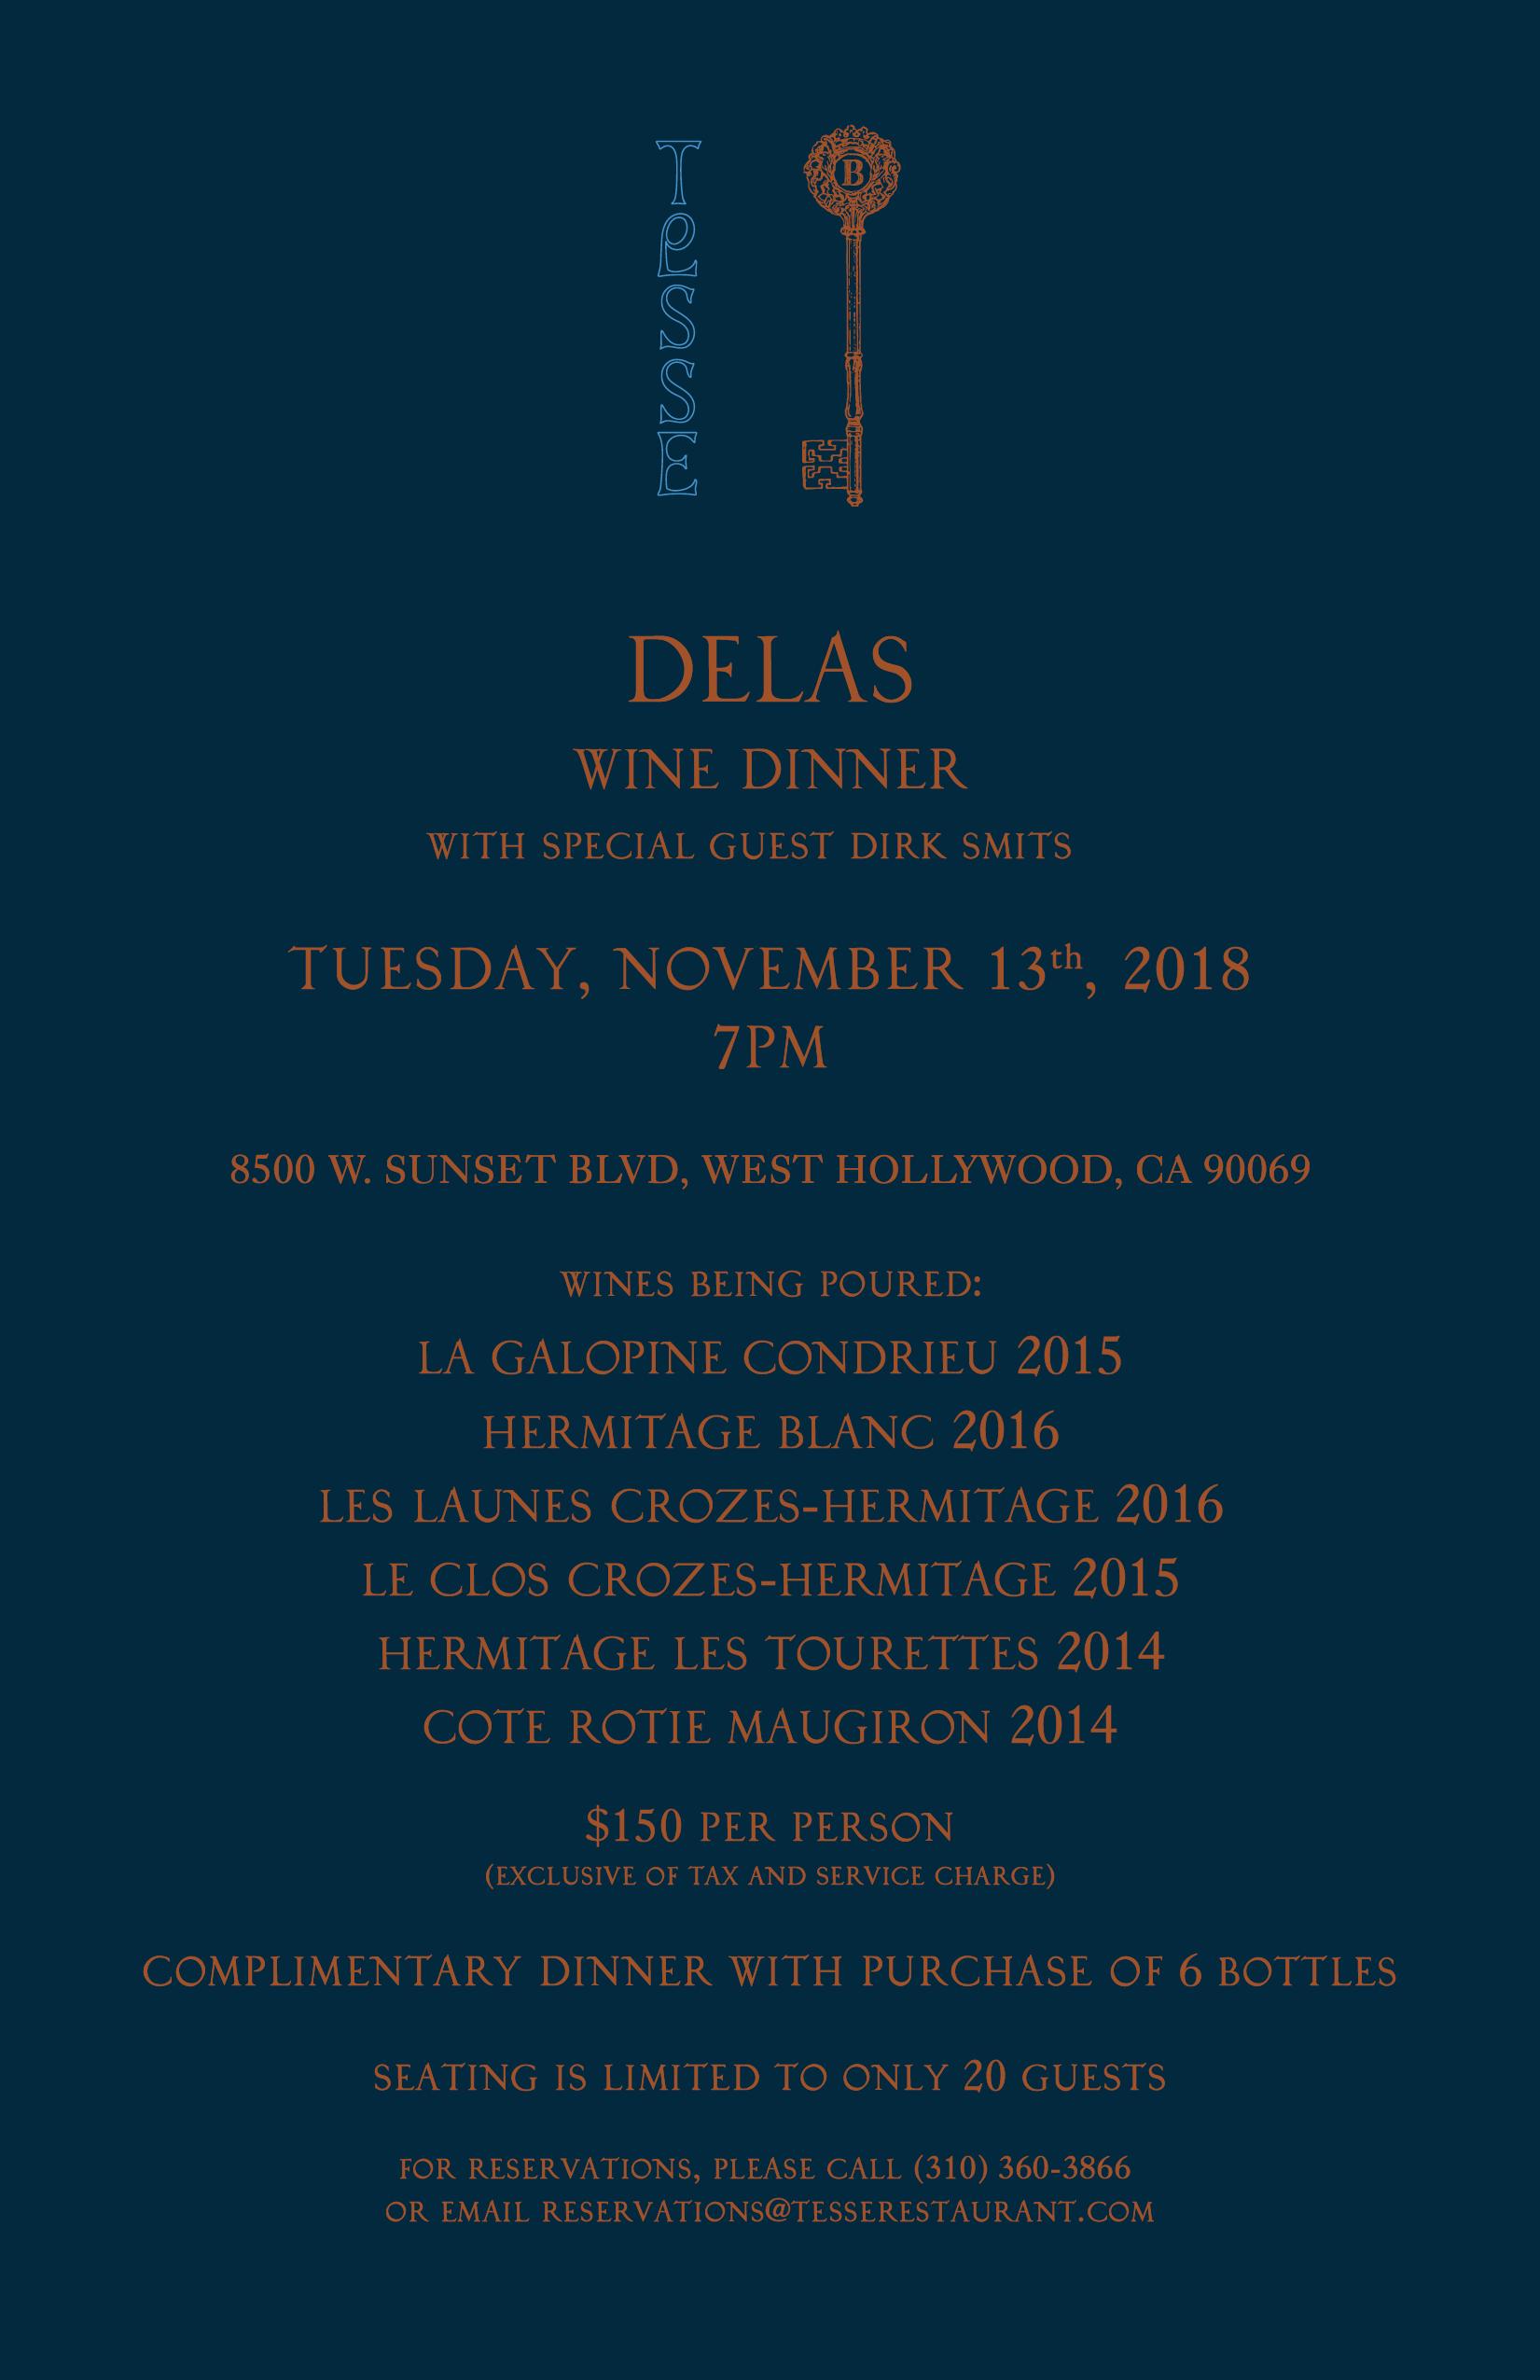 Delas Wine Dinner Invite.png